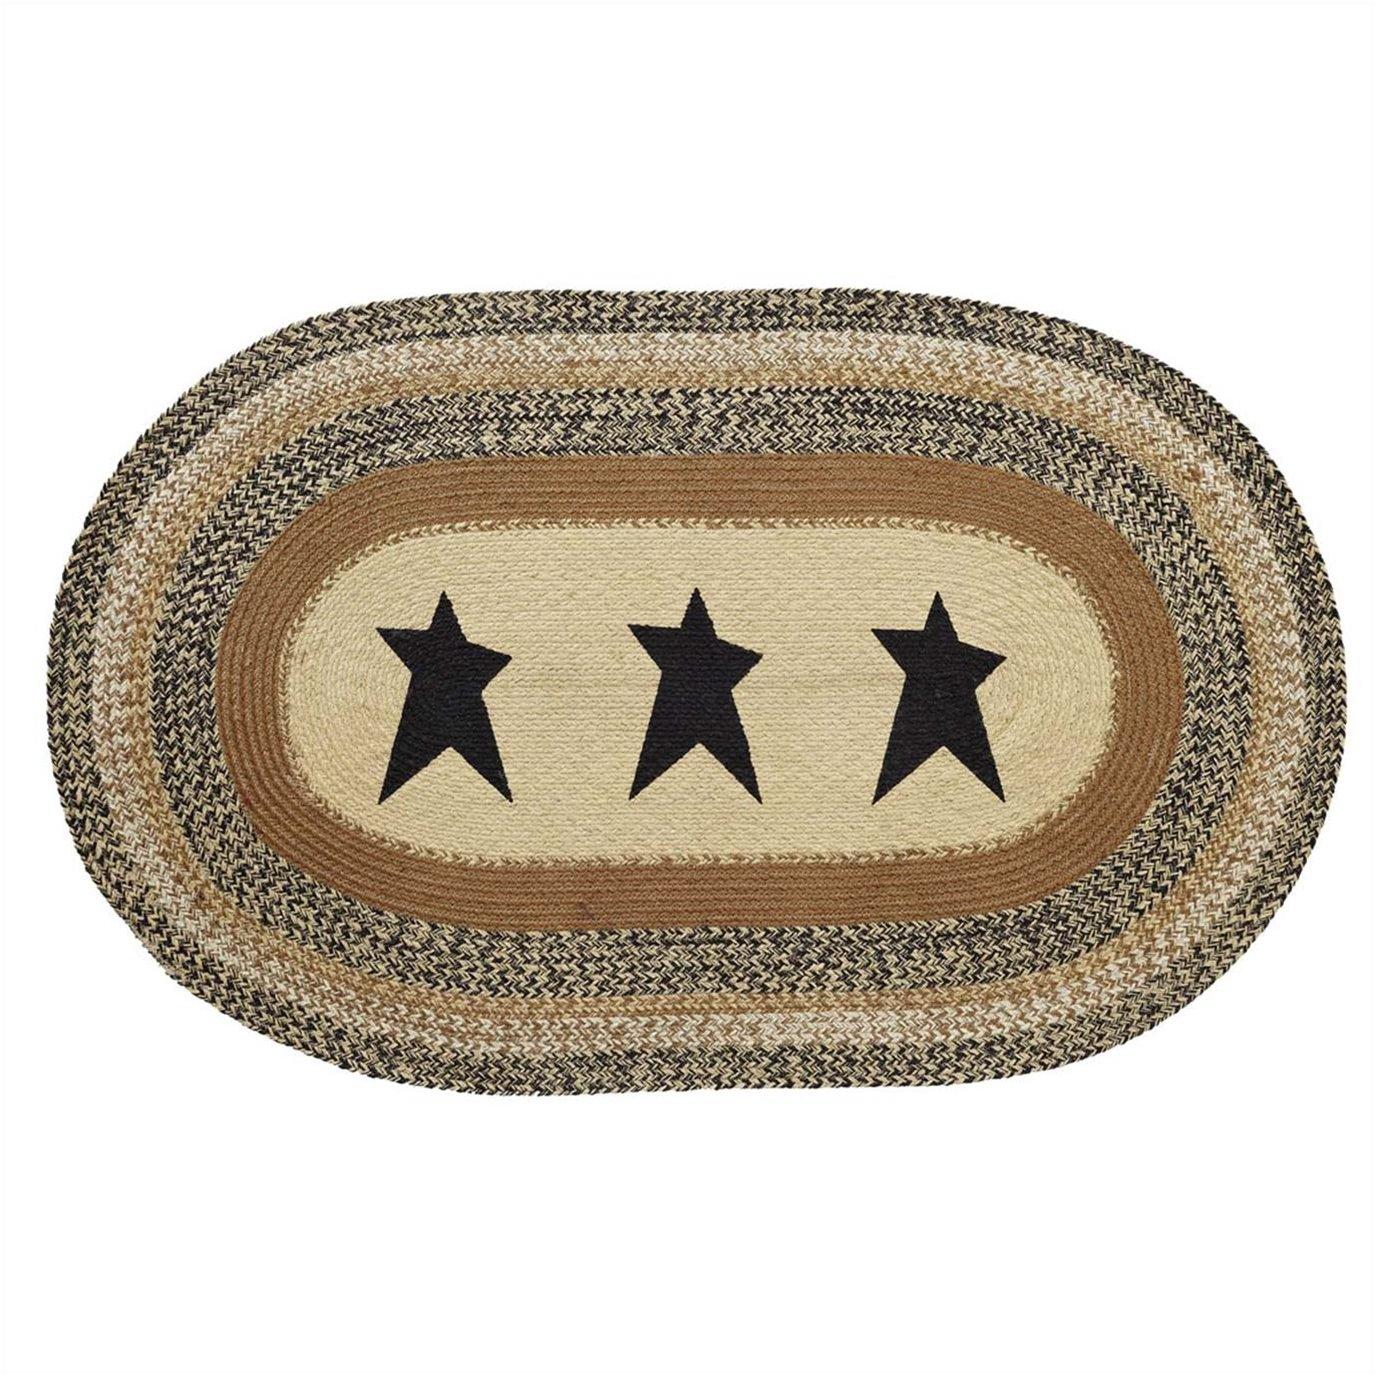 Kettle Grove Jute Rug Oval Stencil Star 36x60